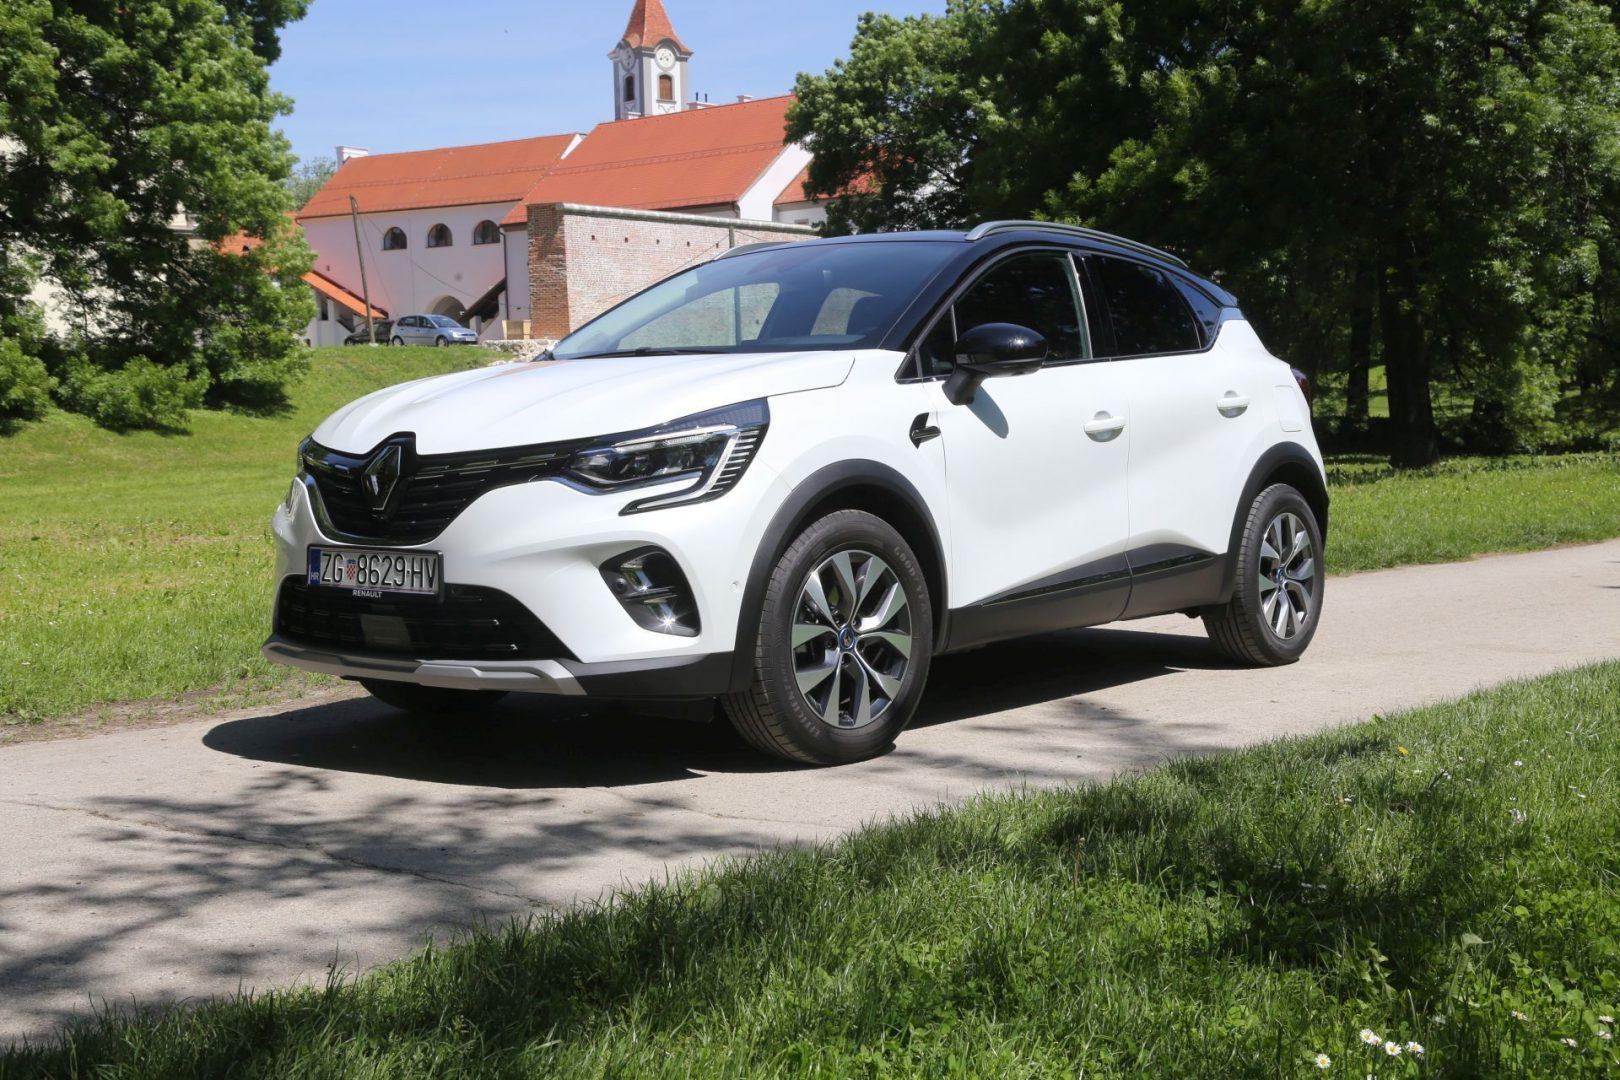 TEST: Renault Captur 1.6 E-Tech Plug-in Hybrid 160 Intens